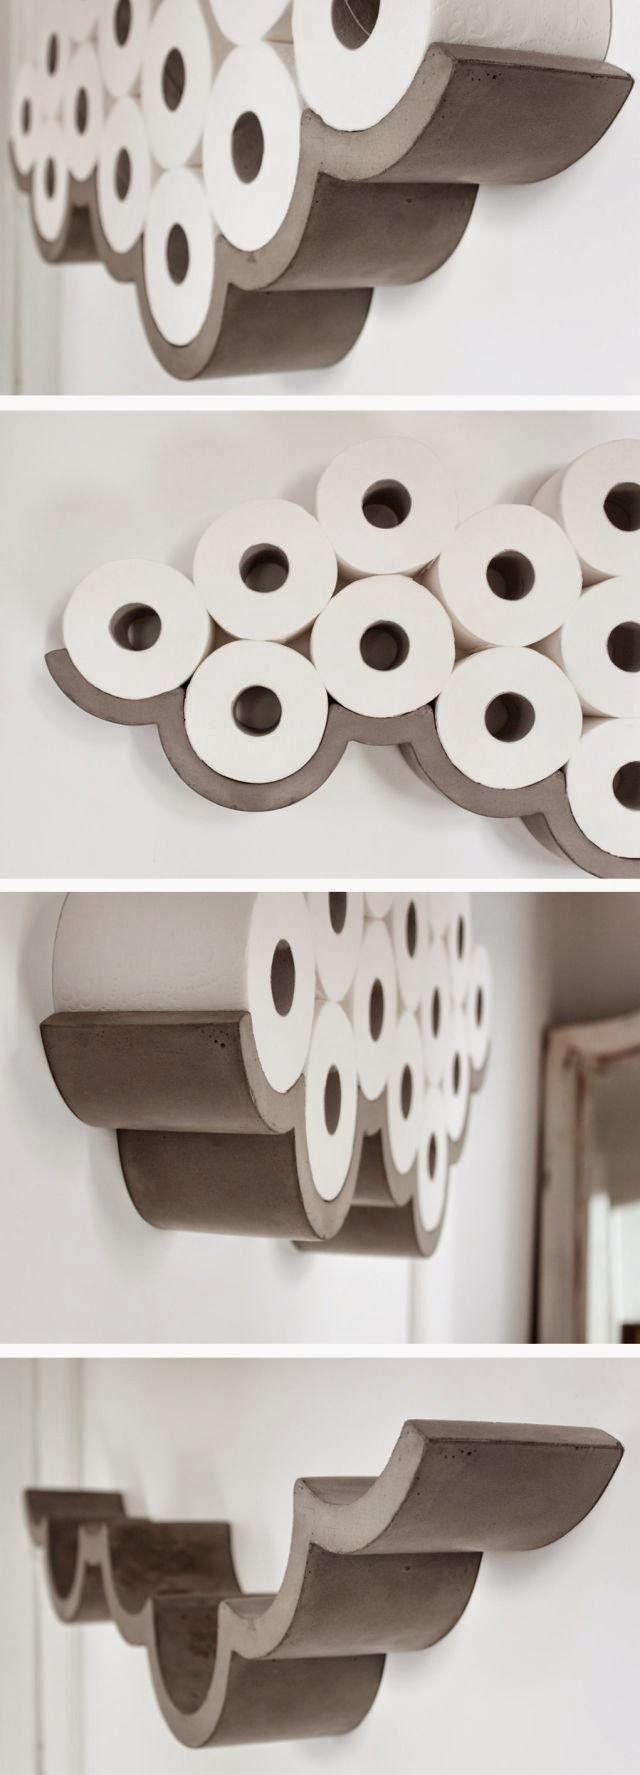 22 Diy Bathroom Decoration Ideas Diy Bathroom Decor